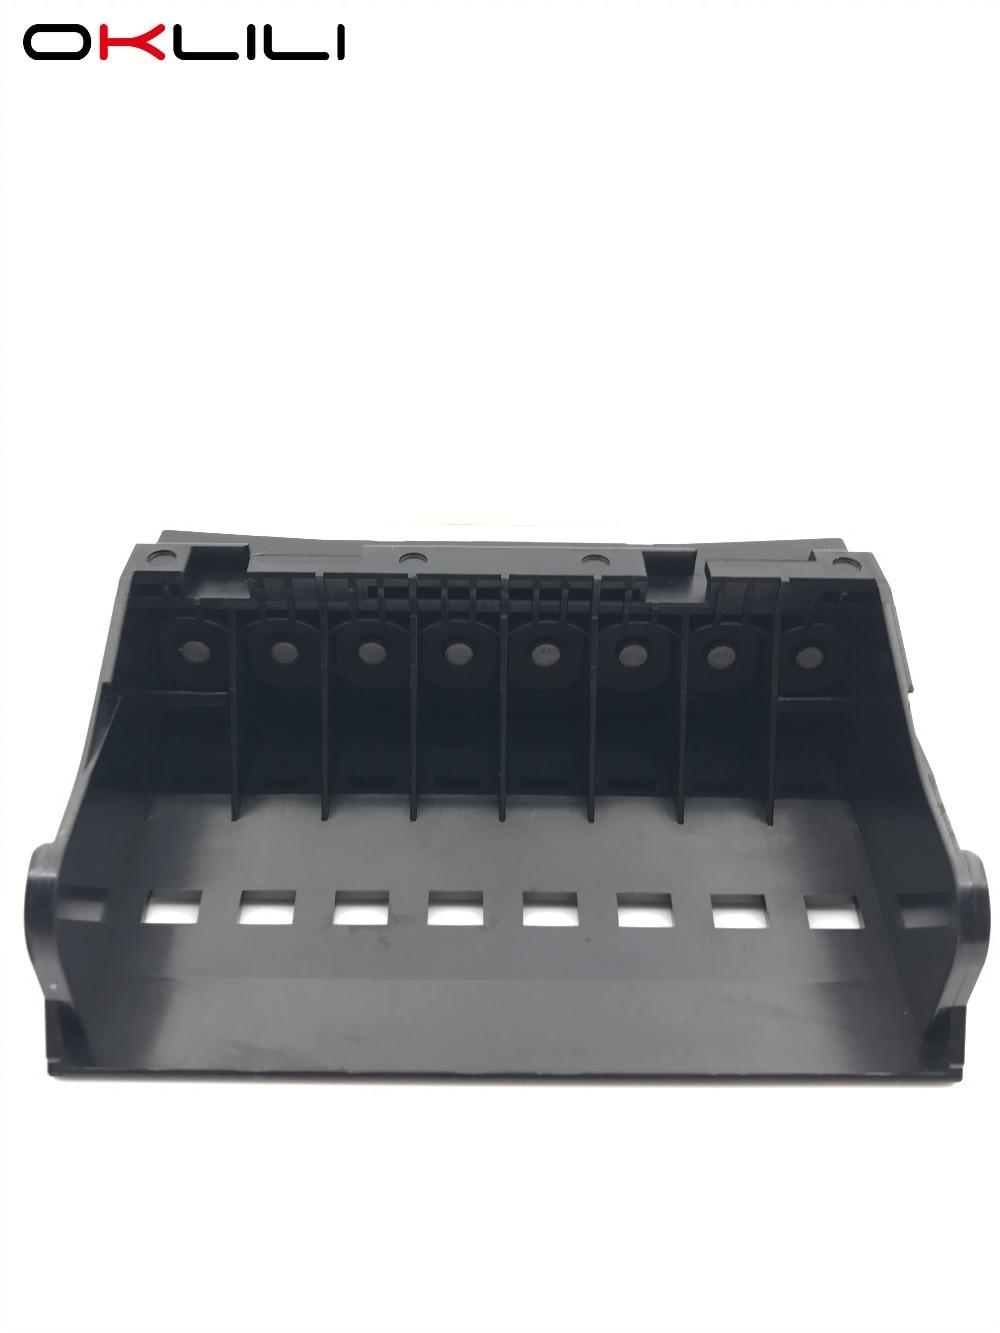 OKLILI ORIGINAL QY6-0055 QY6-0055-000 Printhead Print Head Printer Head for Canon 9900i i9900 i9950 iP8600 iP8500 iP9100 термокружка emsa travel mug grande цвет черный стальной 500 мл